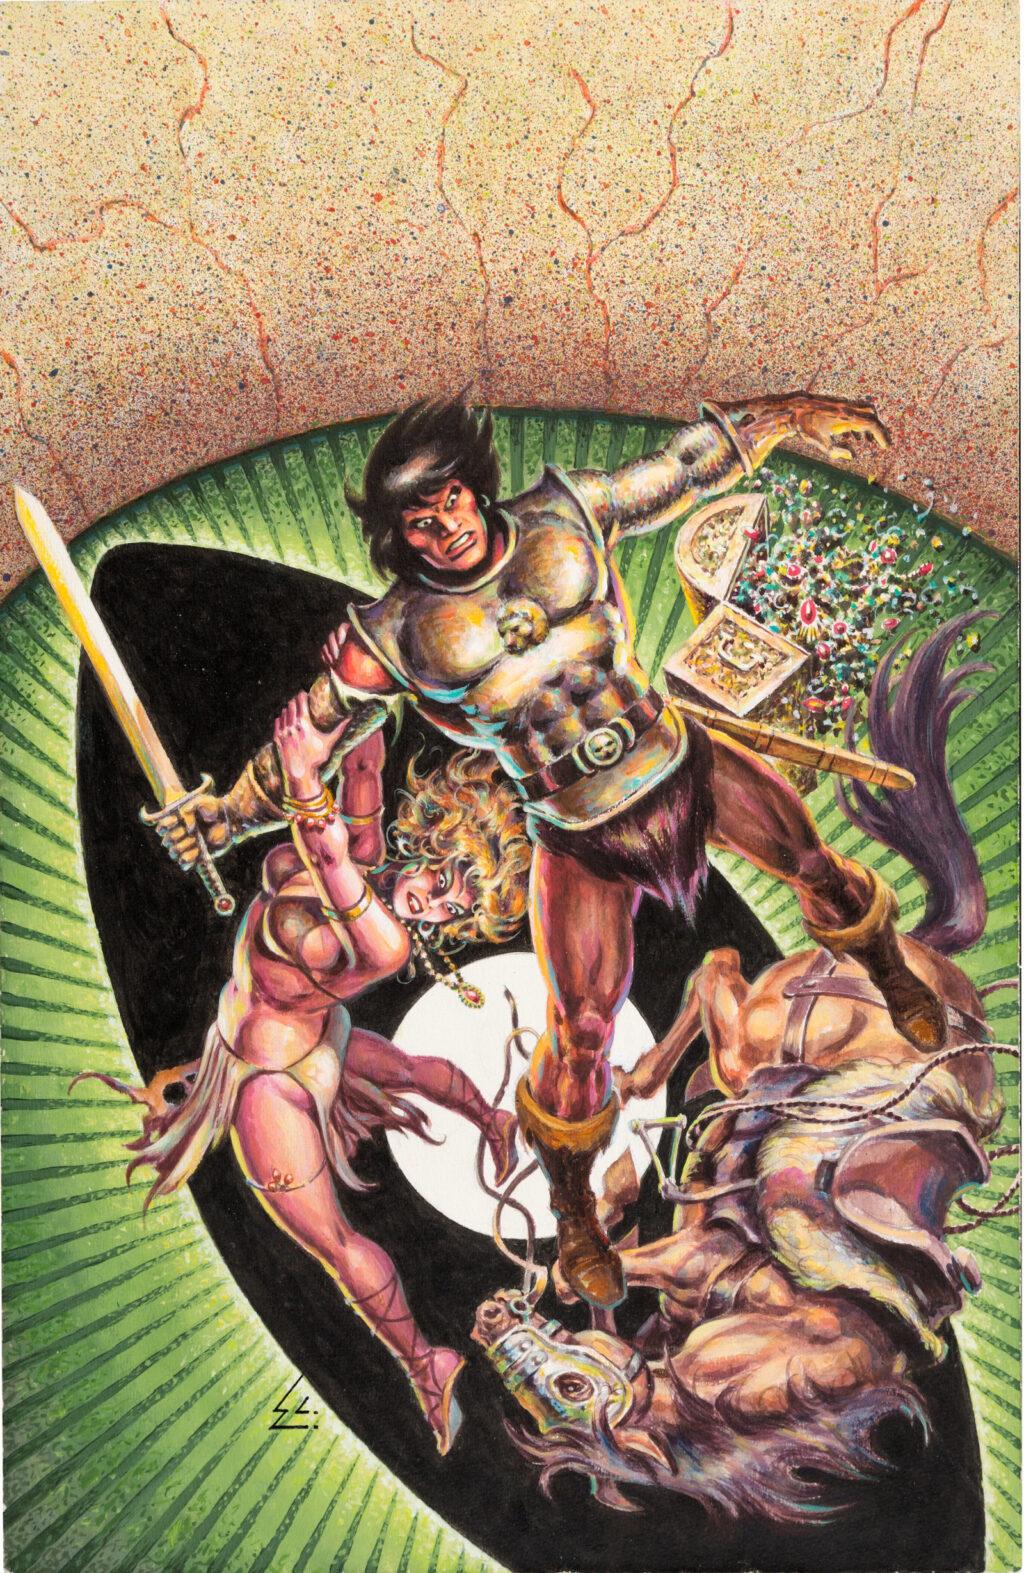 Conan the Barbarian Annual issue 10 cover by Ernie Chan